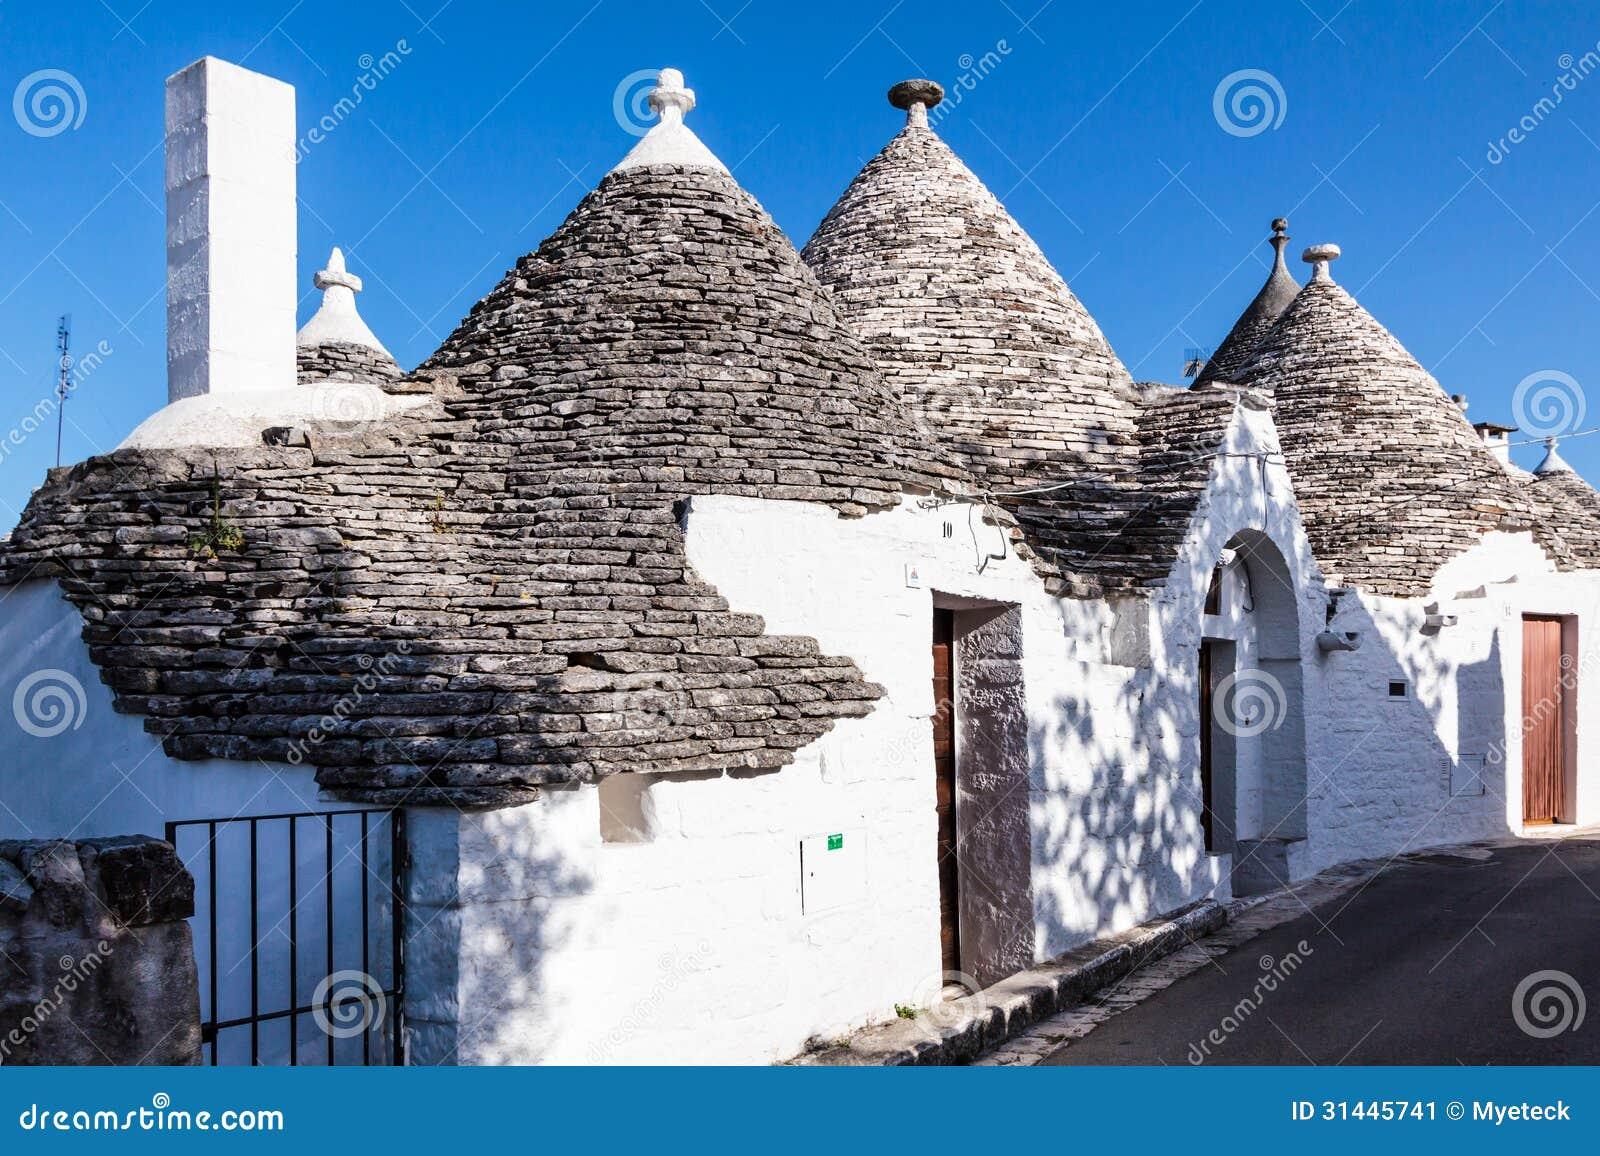 Trulli Houses In Alberobello Italy Stock Image Image